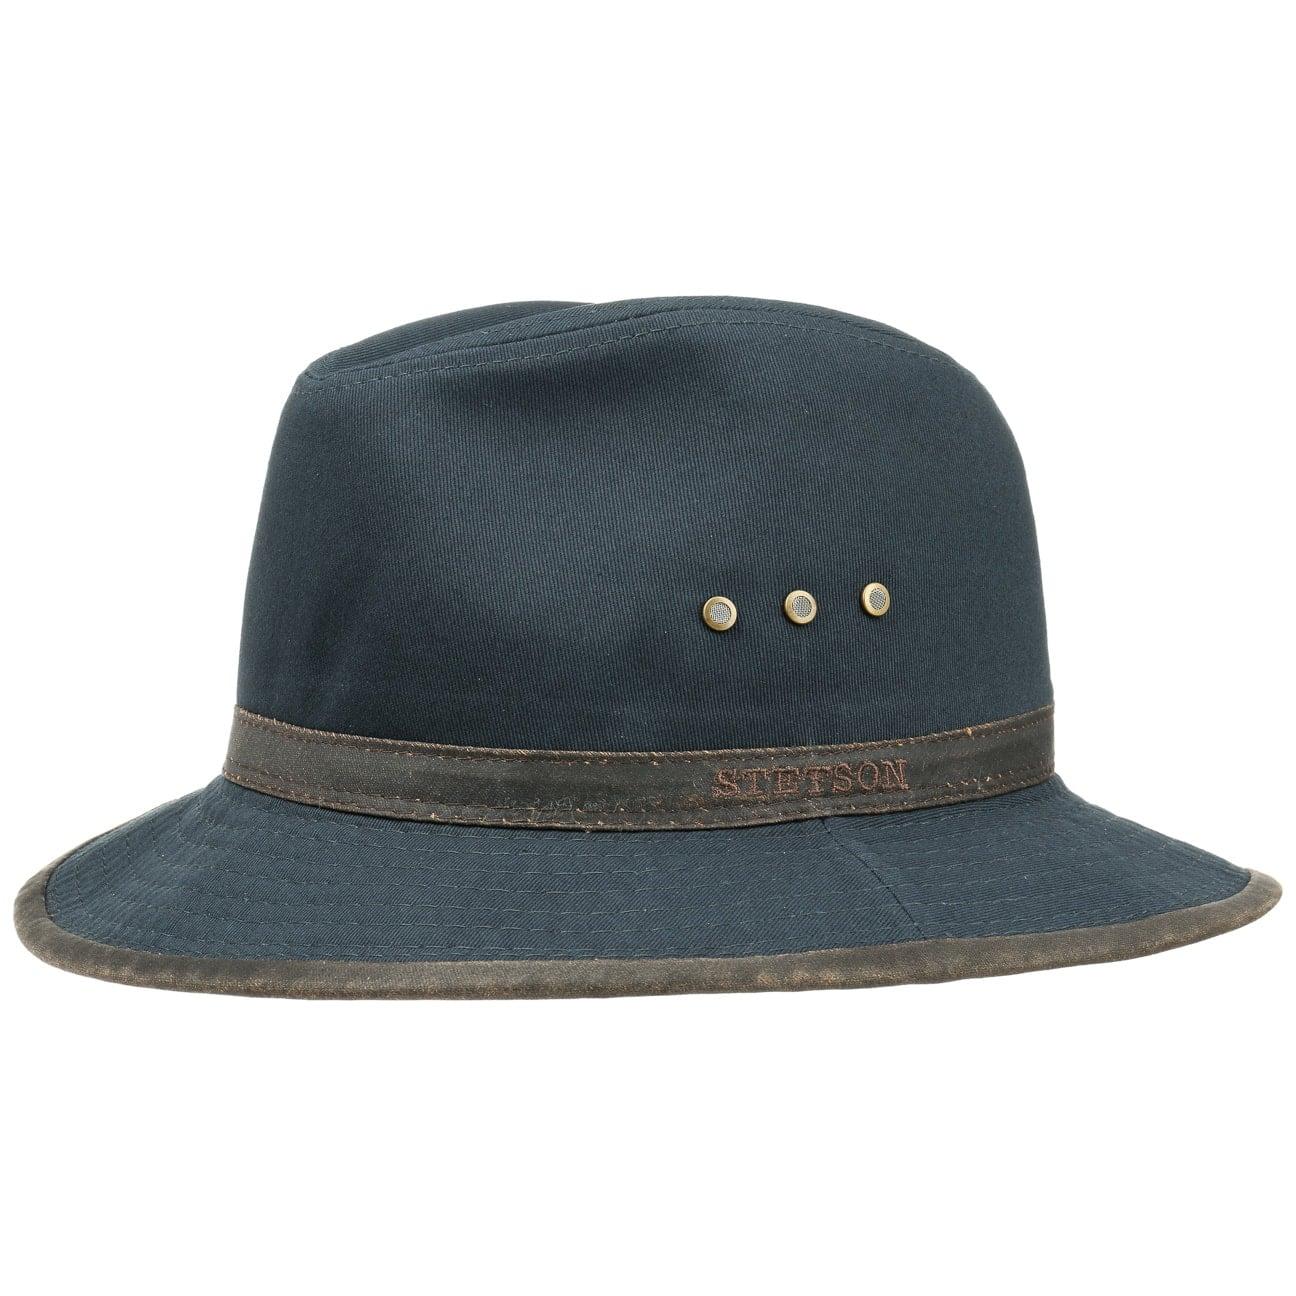 Sombrero de Algod?n Ava by Stetson